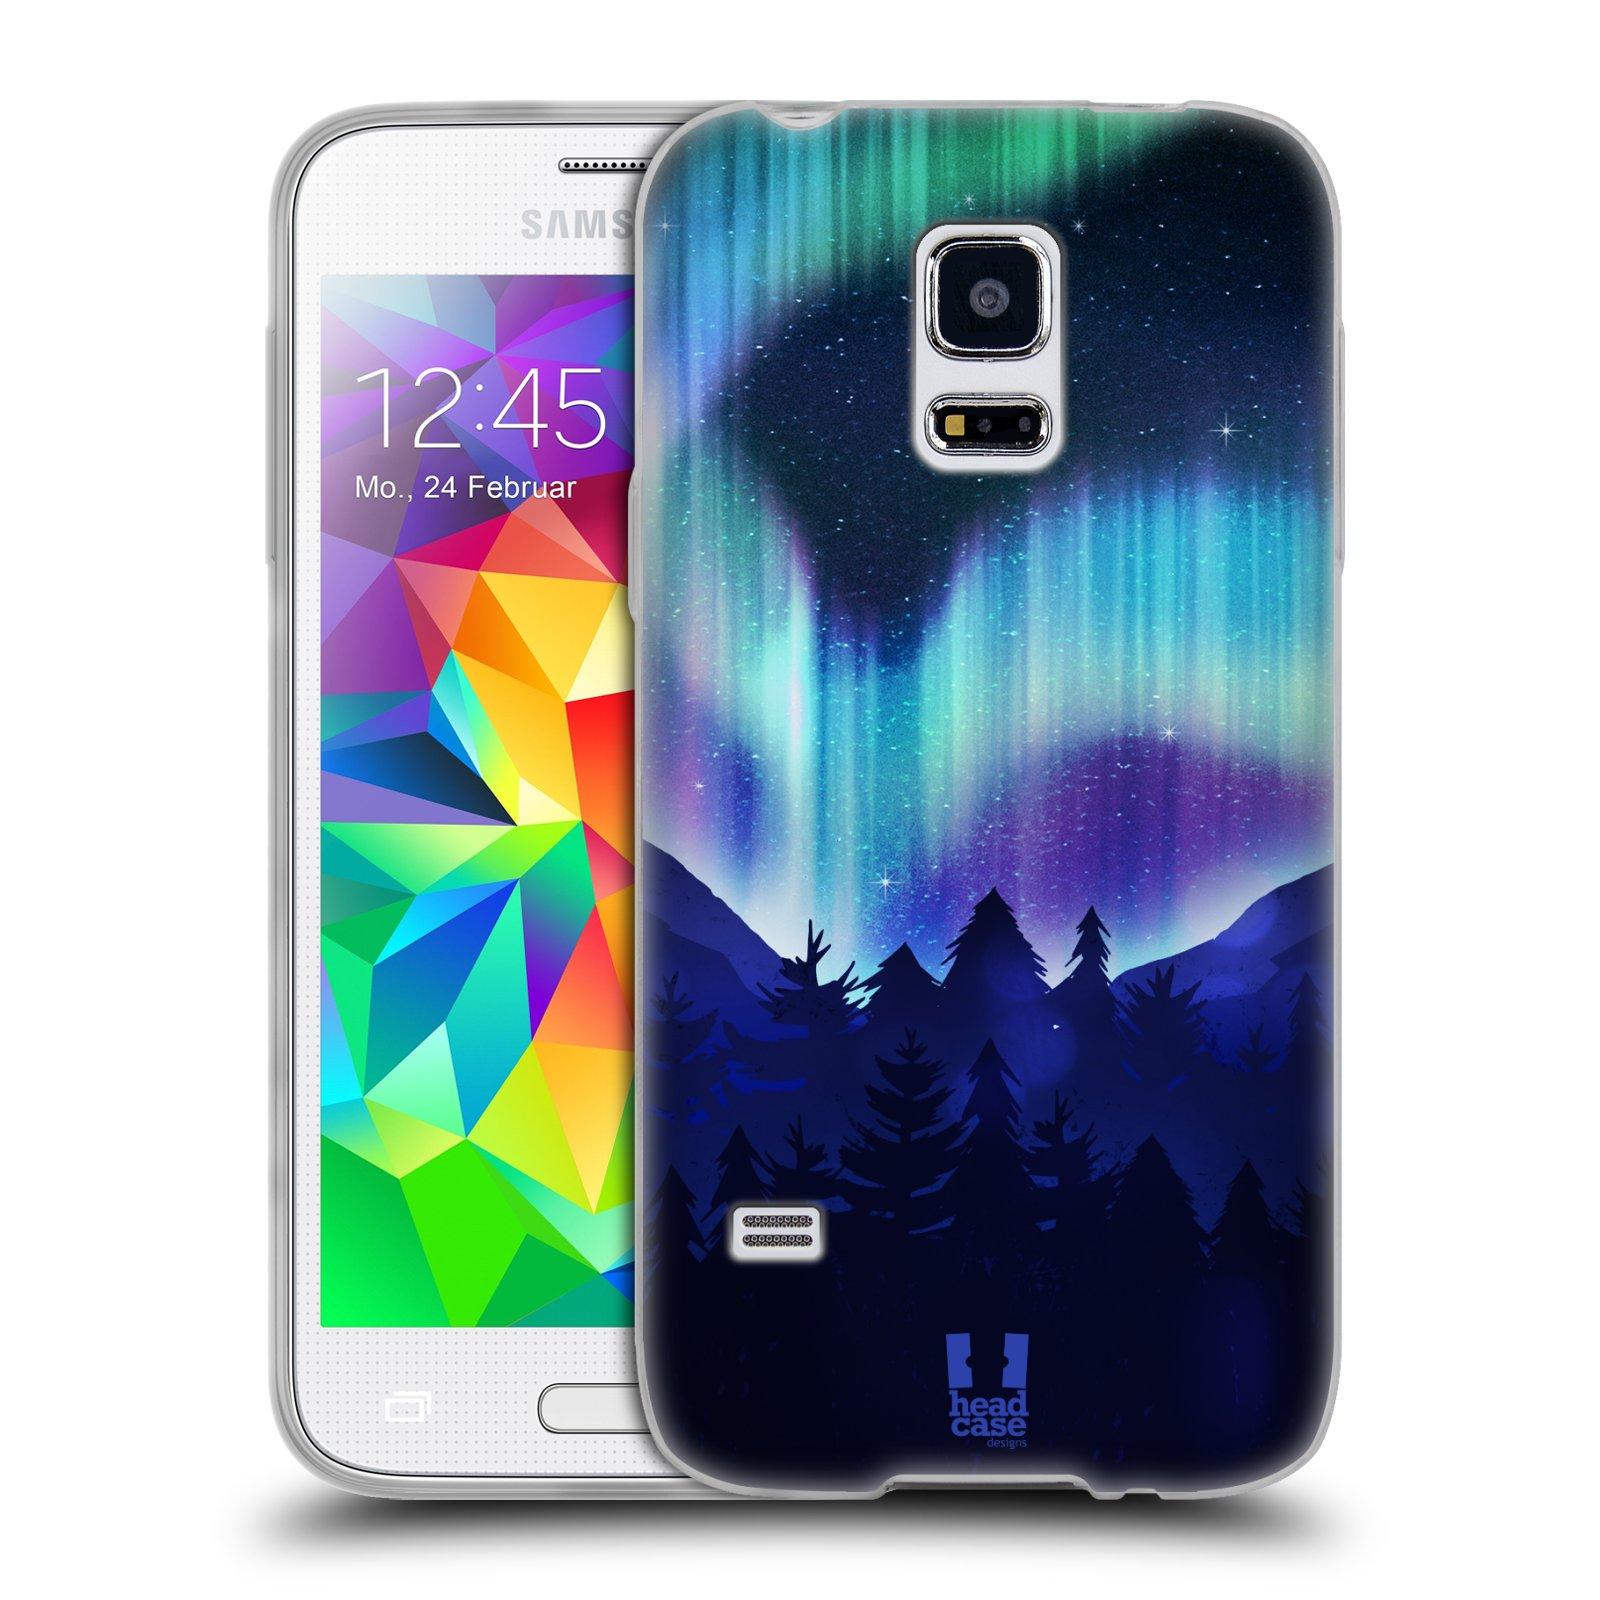 Silikonové pouzdro na mobil Samsung Galaxy S5 Mini HEAD CASE Polární Záře Borovice (Silikonový kryt či obal na mobilní telefon Samsung Galaxy S5 Mini SM-G800F)